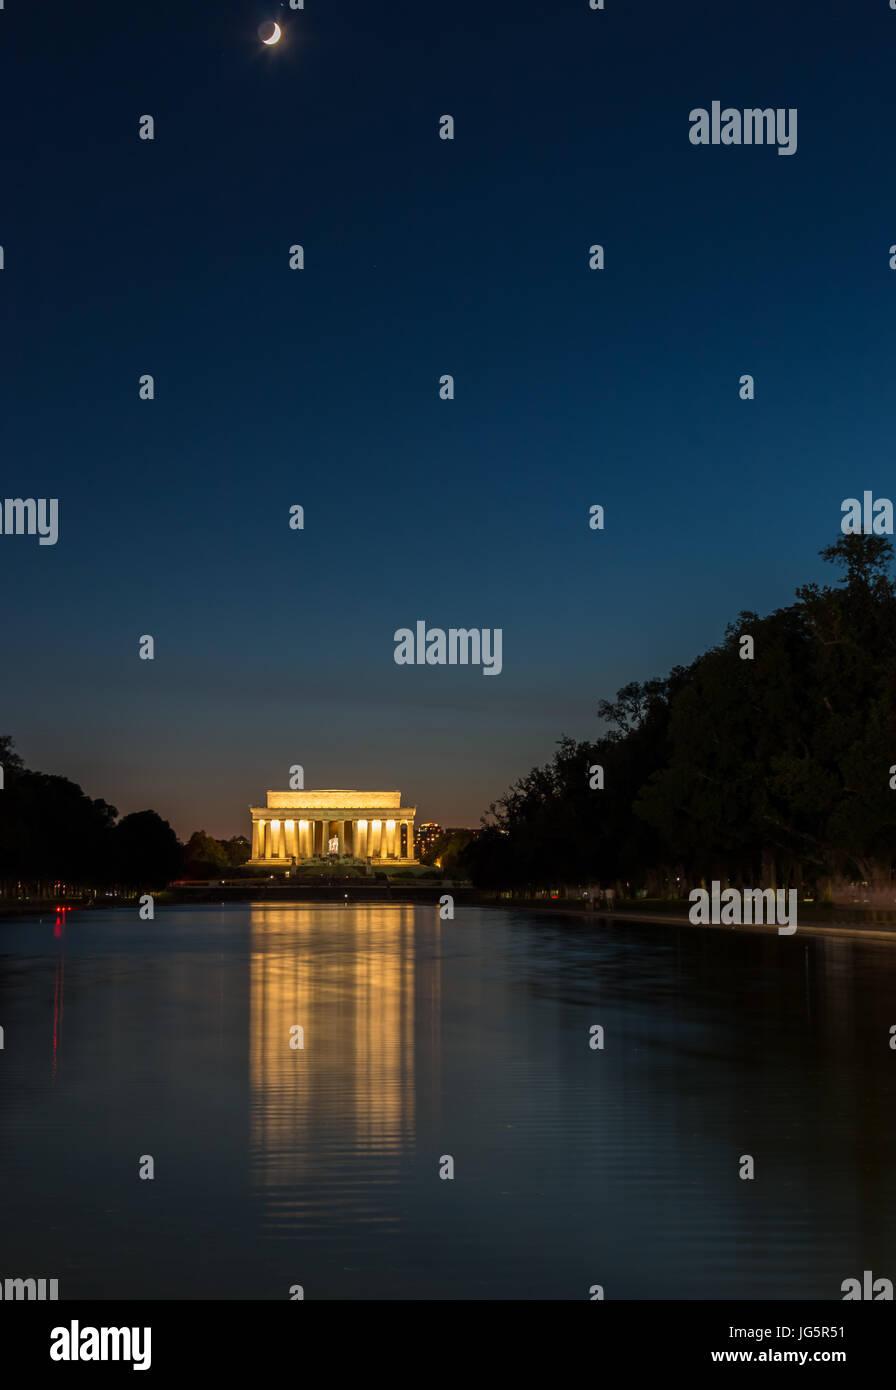 Lincoln Memorial Reflecting on Piscine avec lune haute dans le ciel Photo Stock